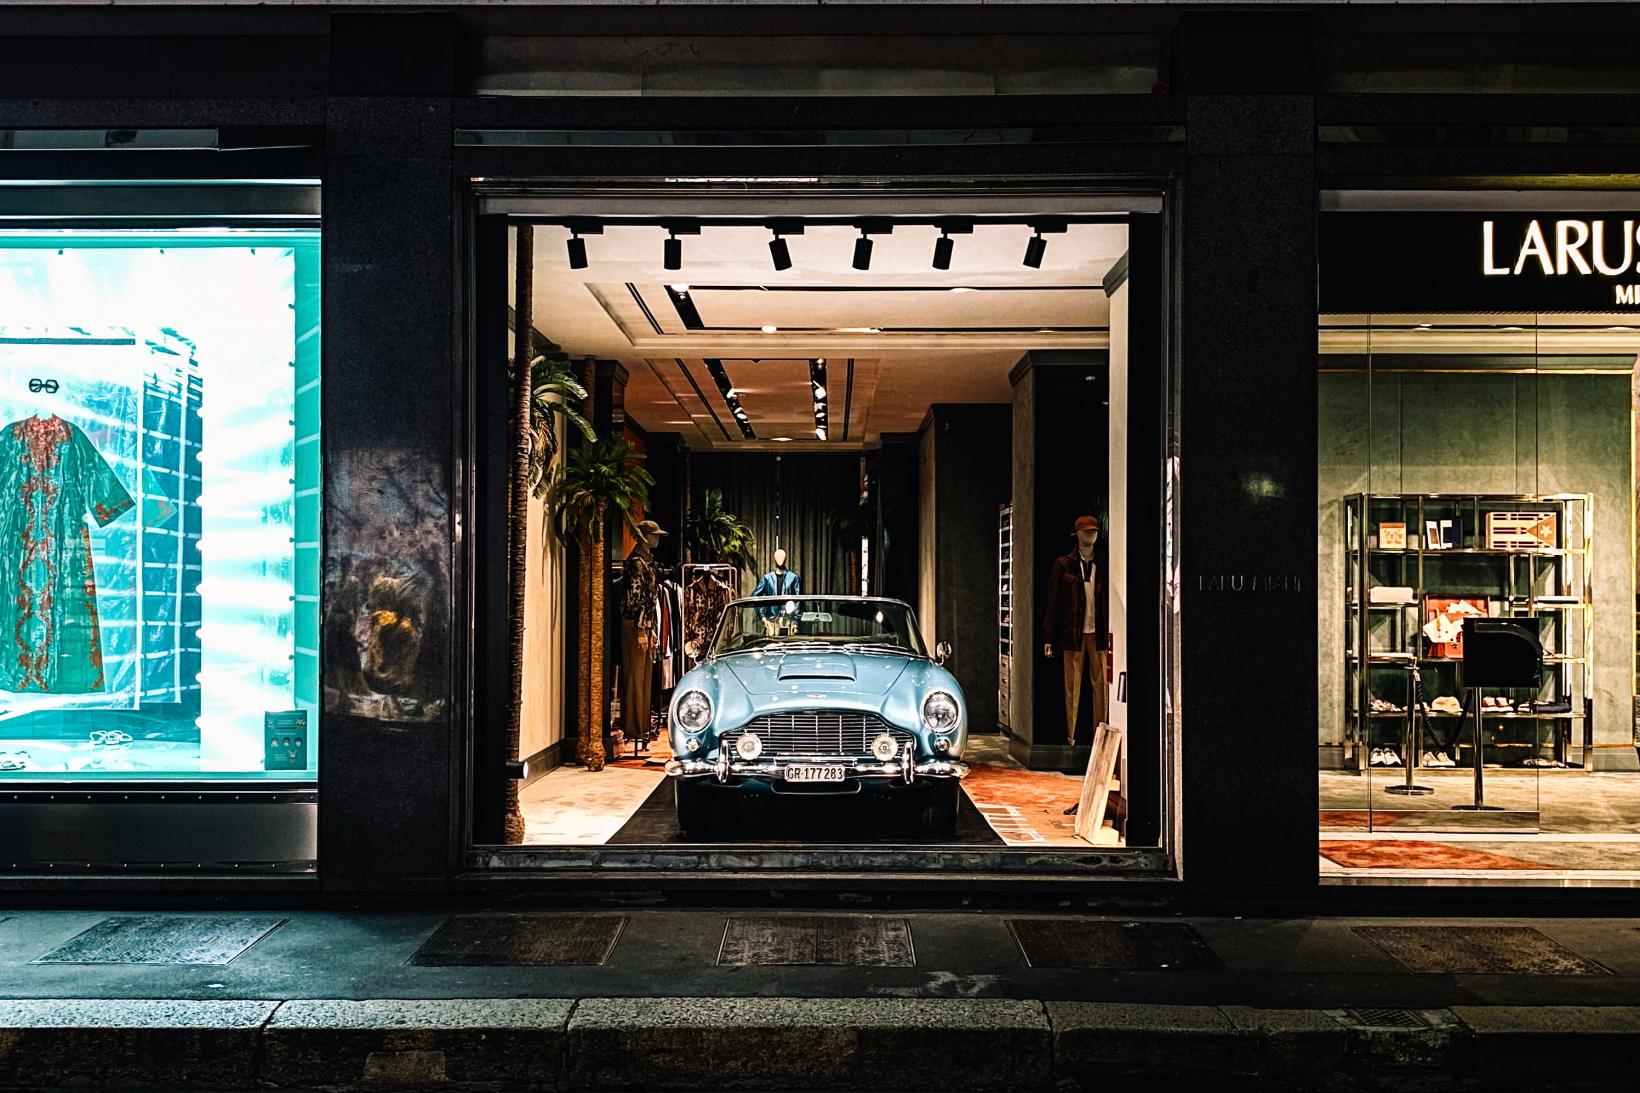 MonteNapoleone District: Milanese luxury between crisis and rebirth